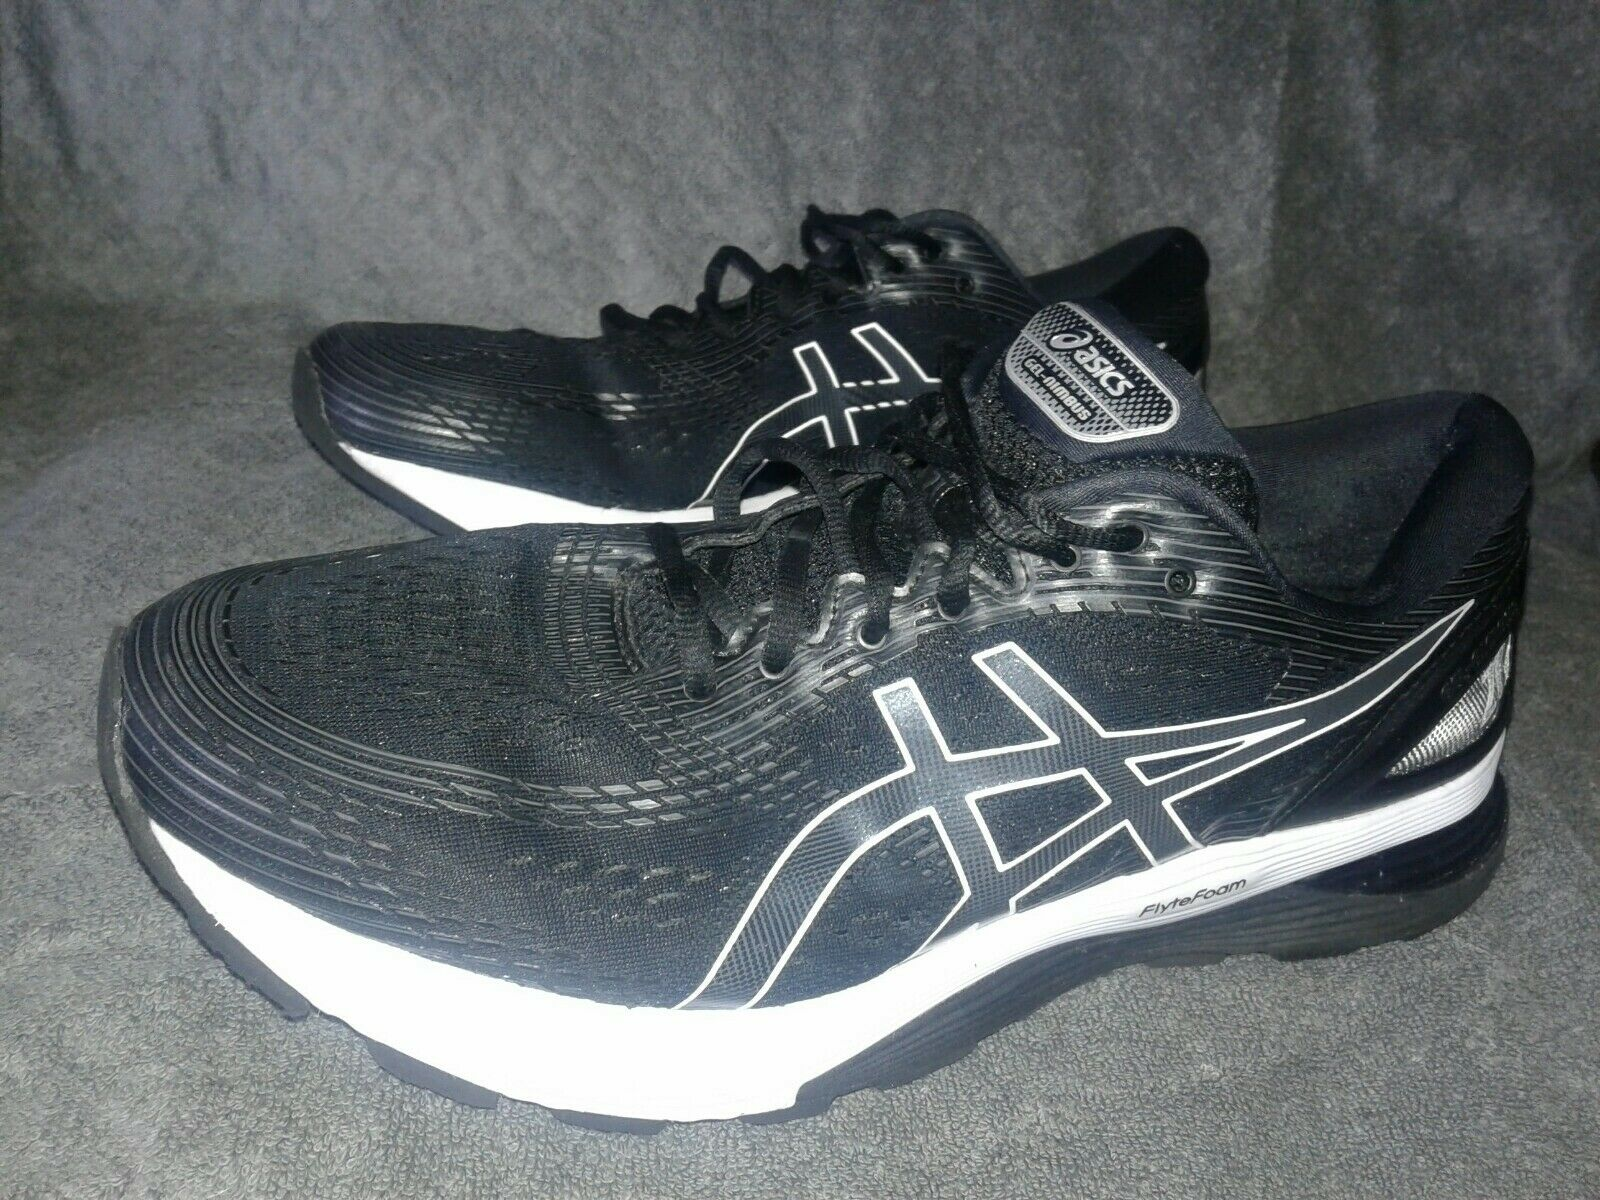 Mens Asics Nimbus 21 Size 12.5 Wide Running Walking Training